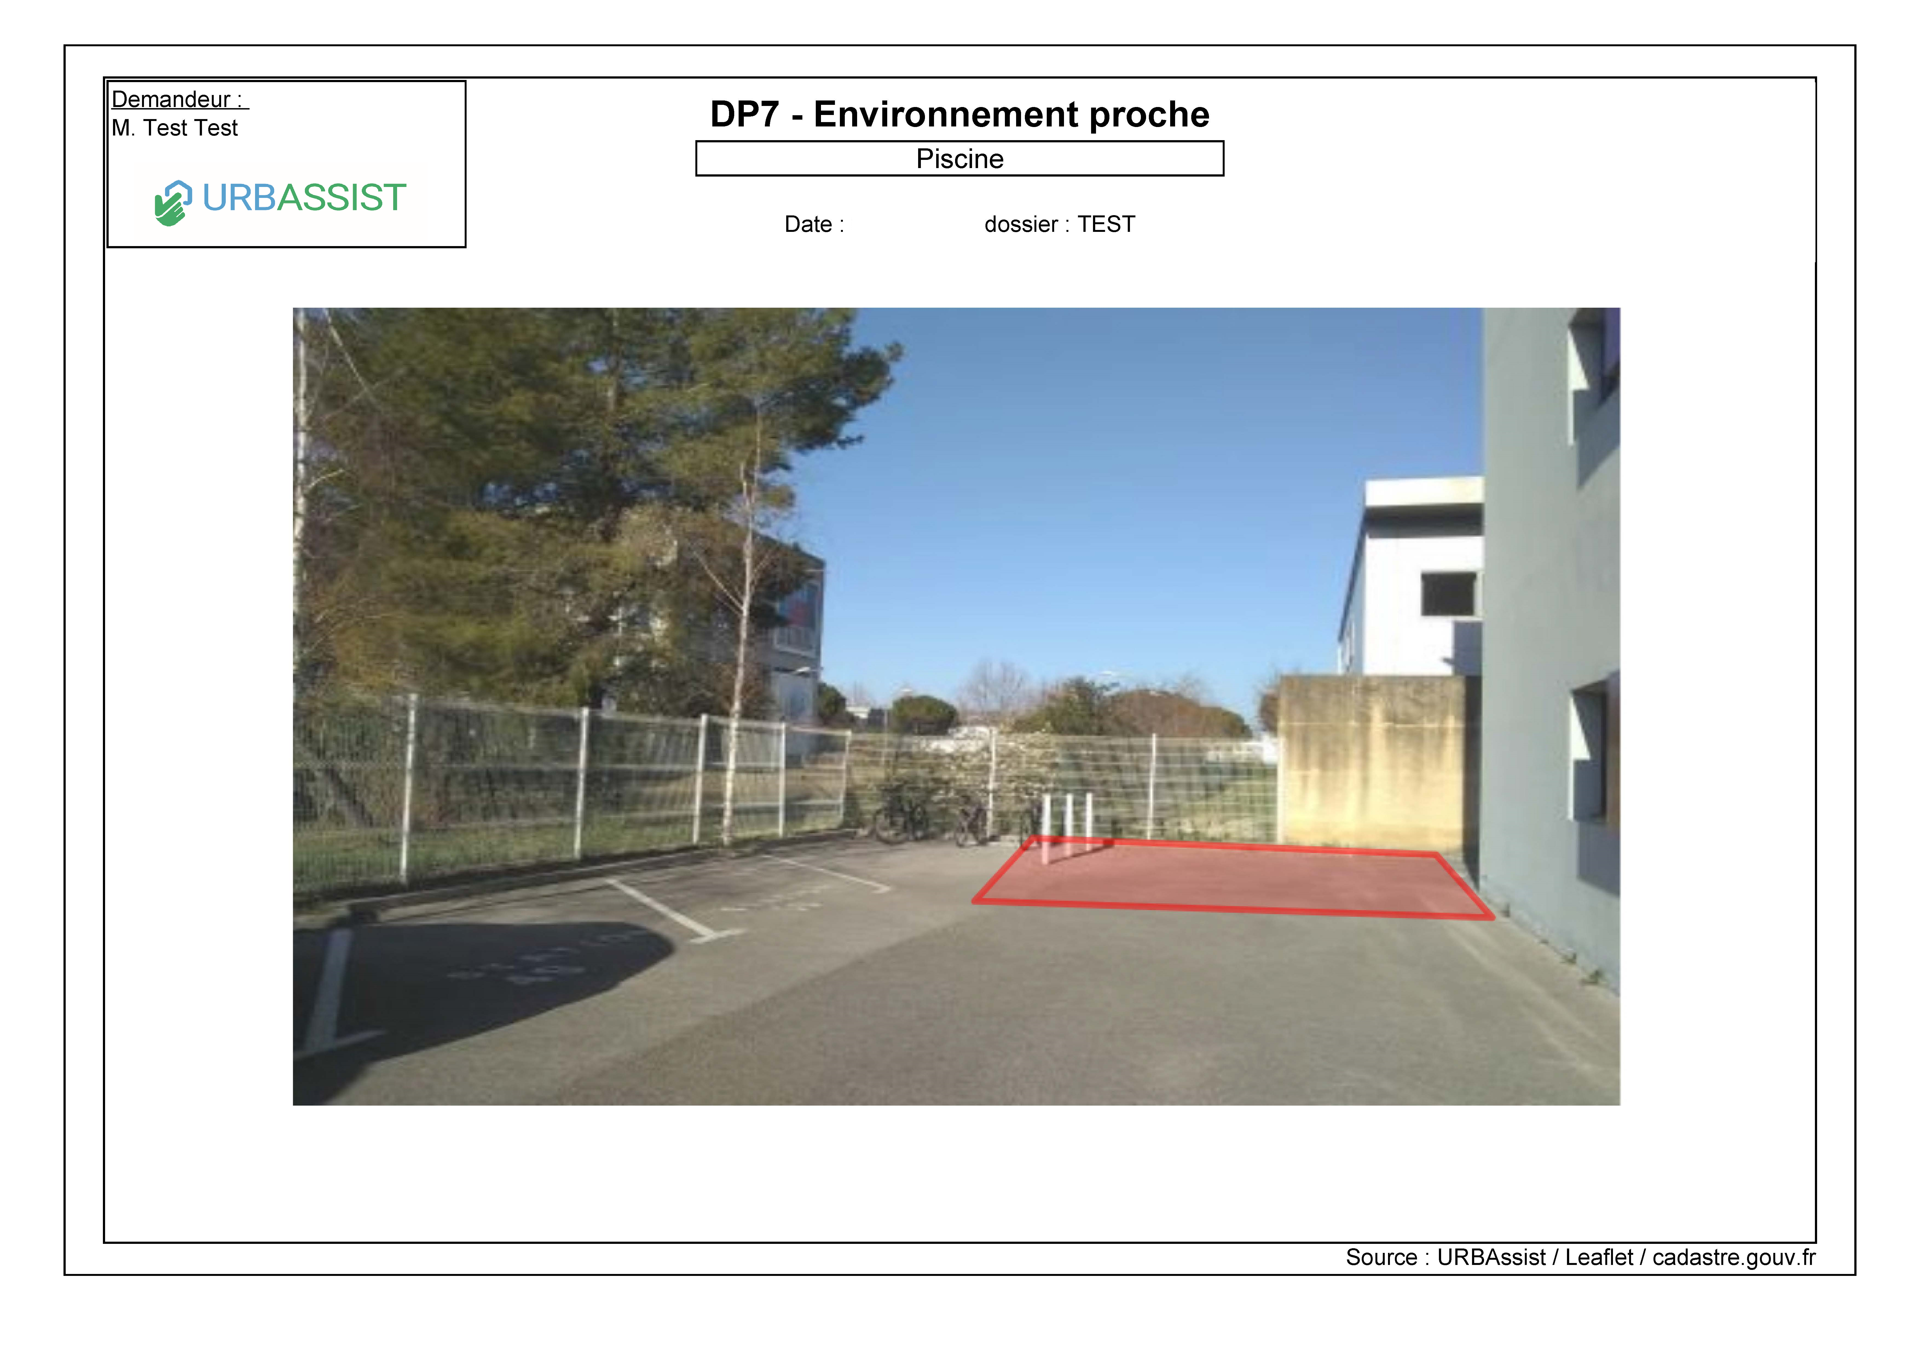 Projet Piscine : DP7 Environnement proche